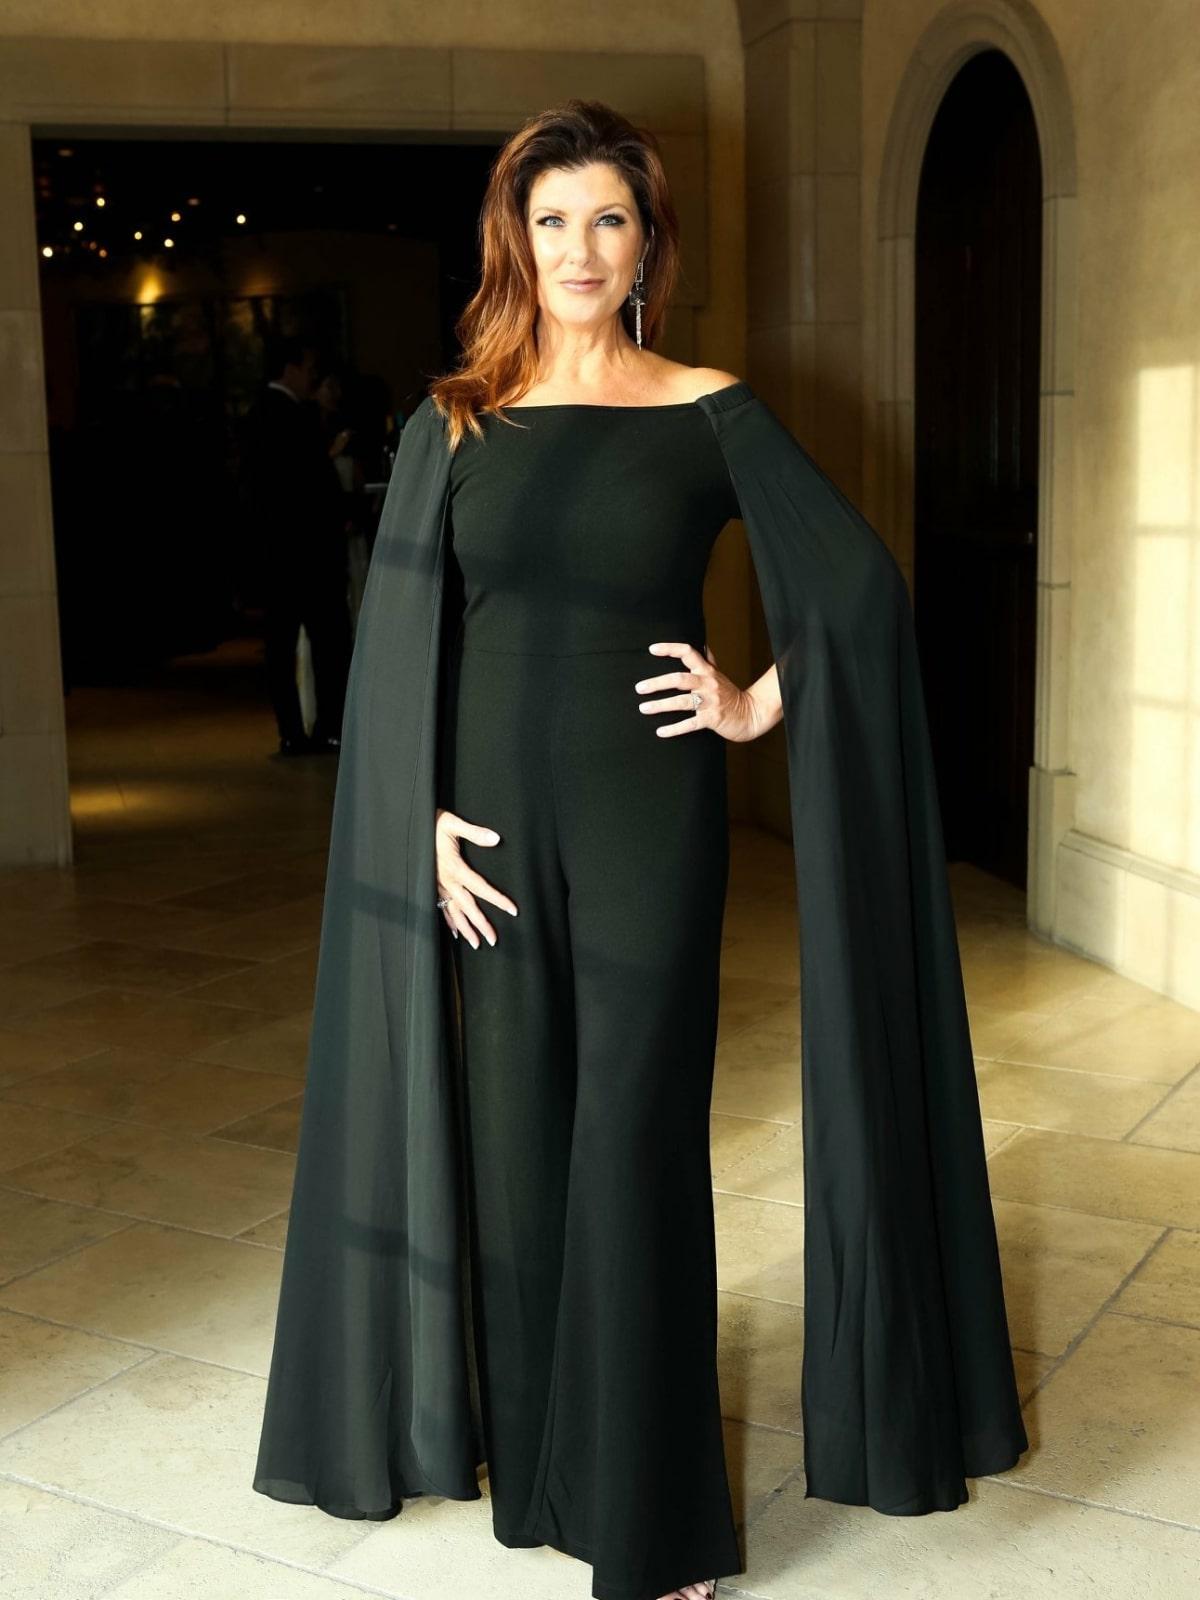 Fashion Stars for a Cause 2018, Cynthia Smoot